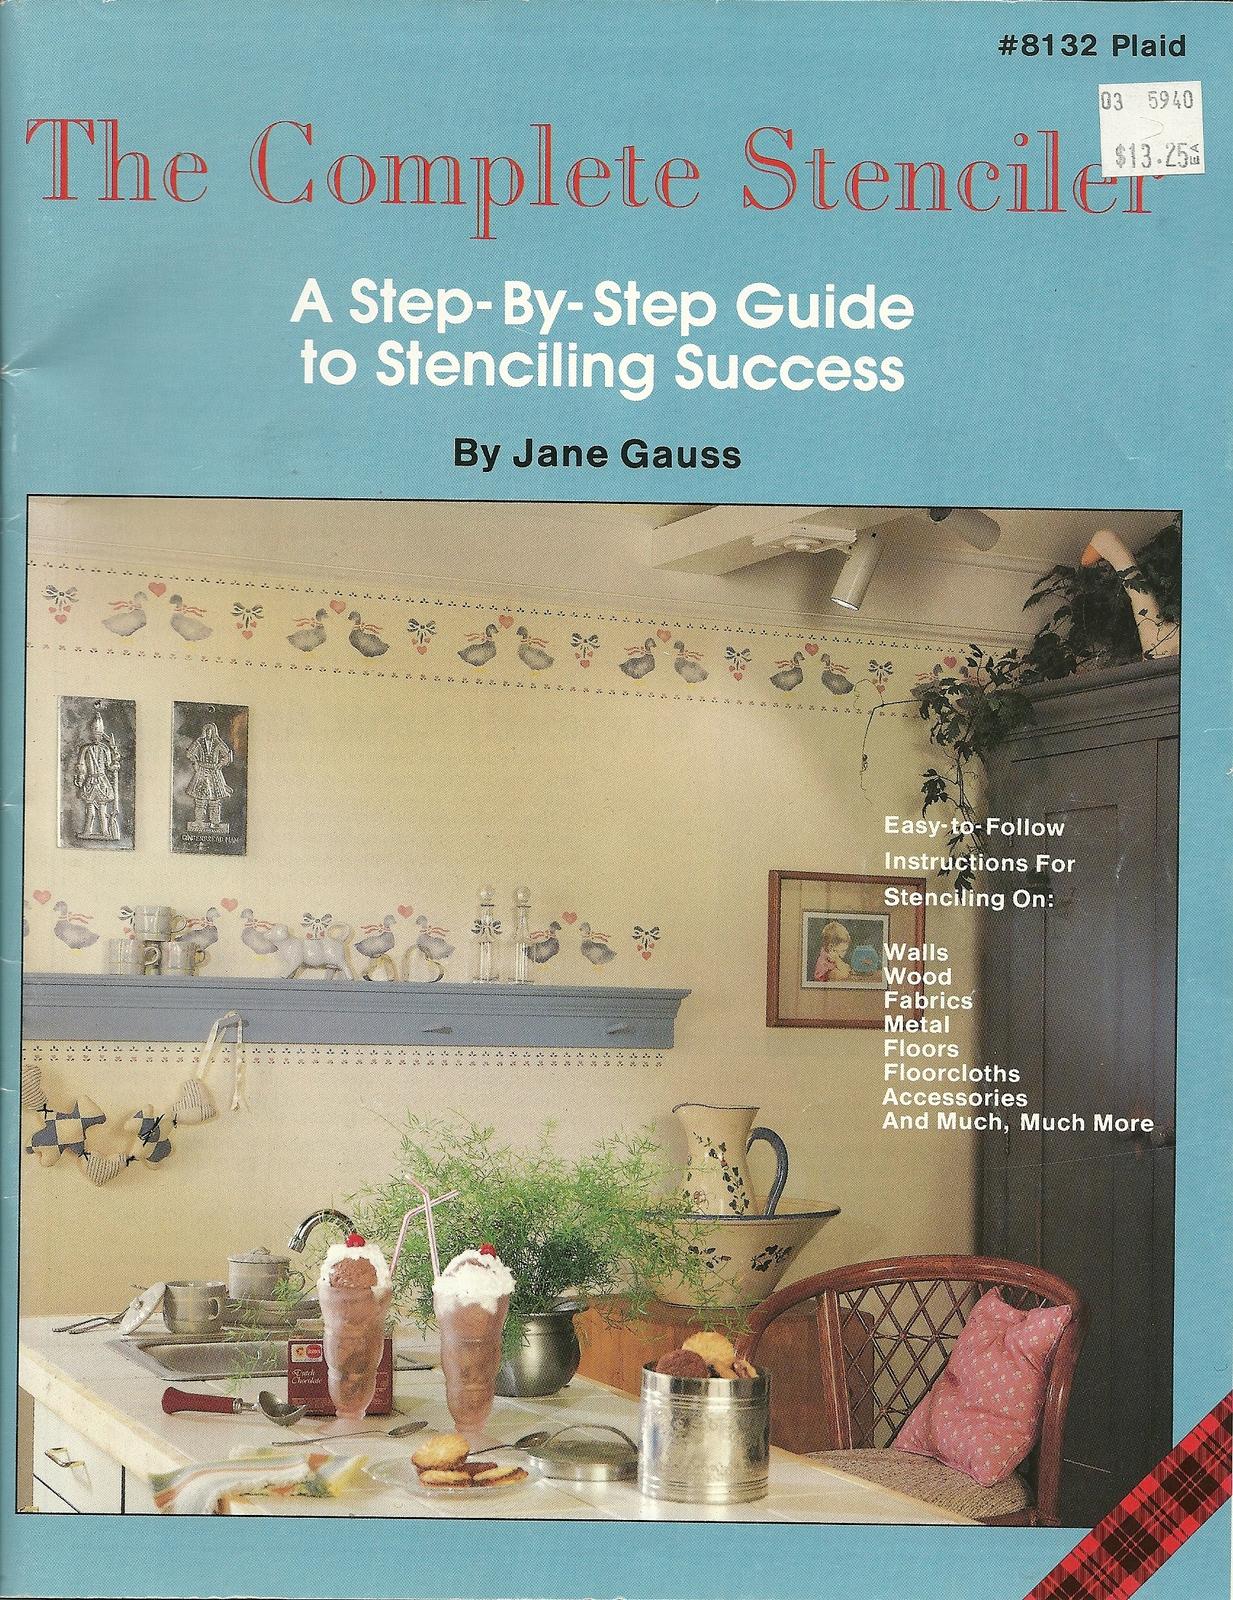 Complete stenciler book plaid 8132 jane gauss home decor crafts stenciling  1